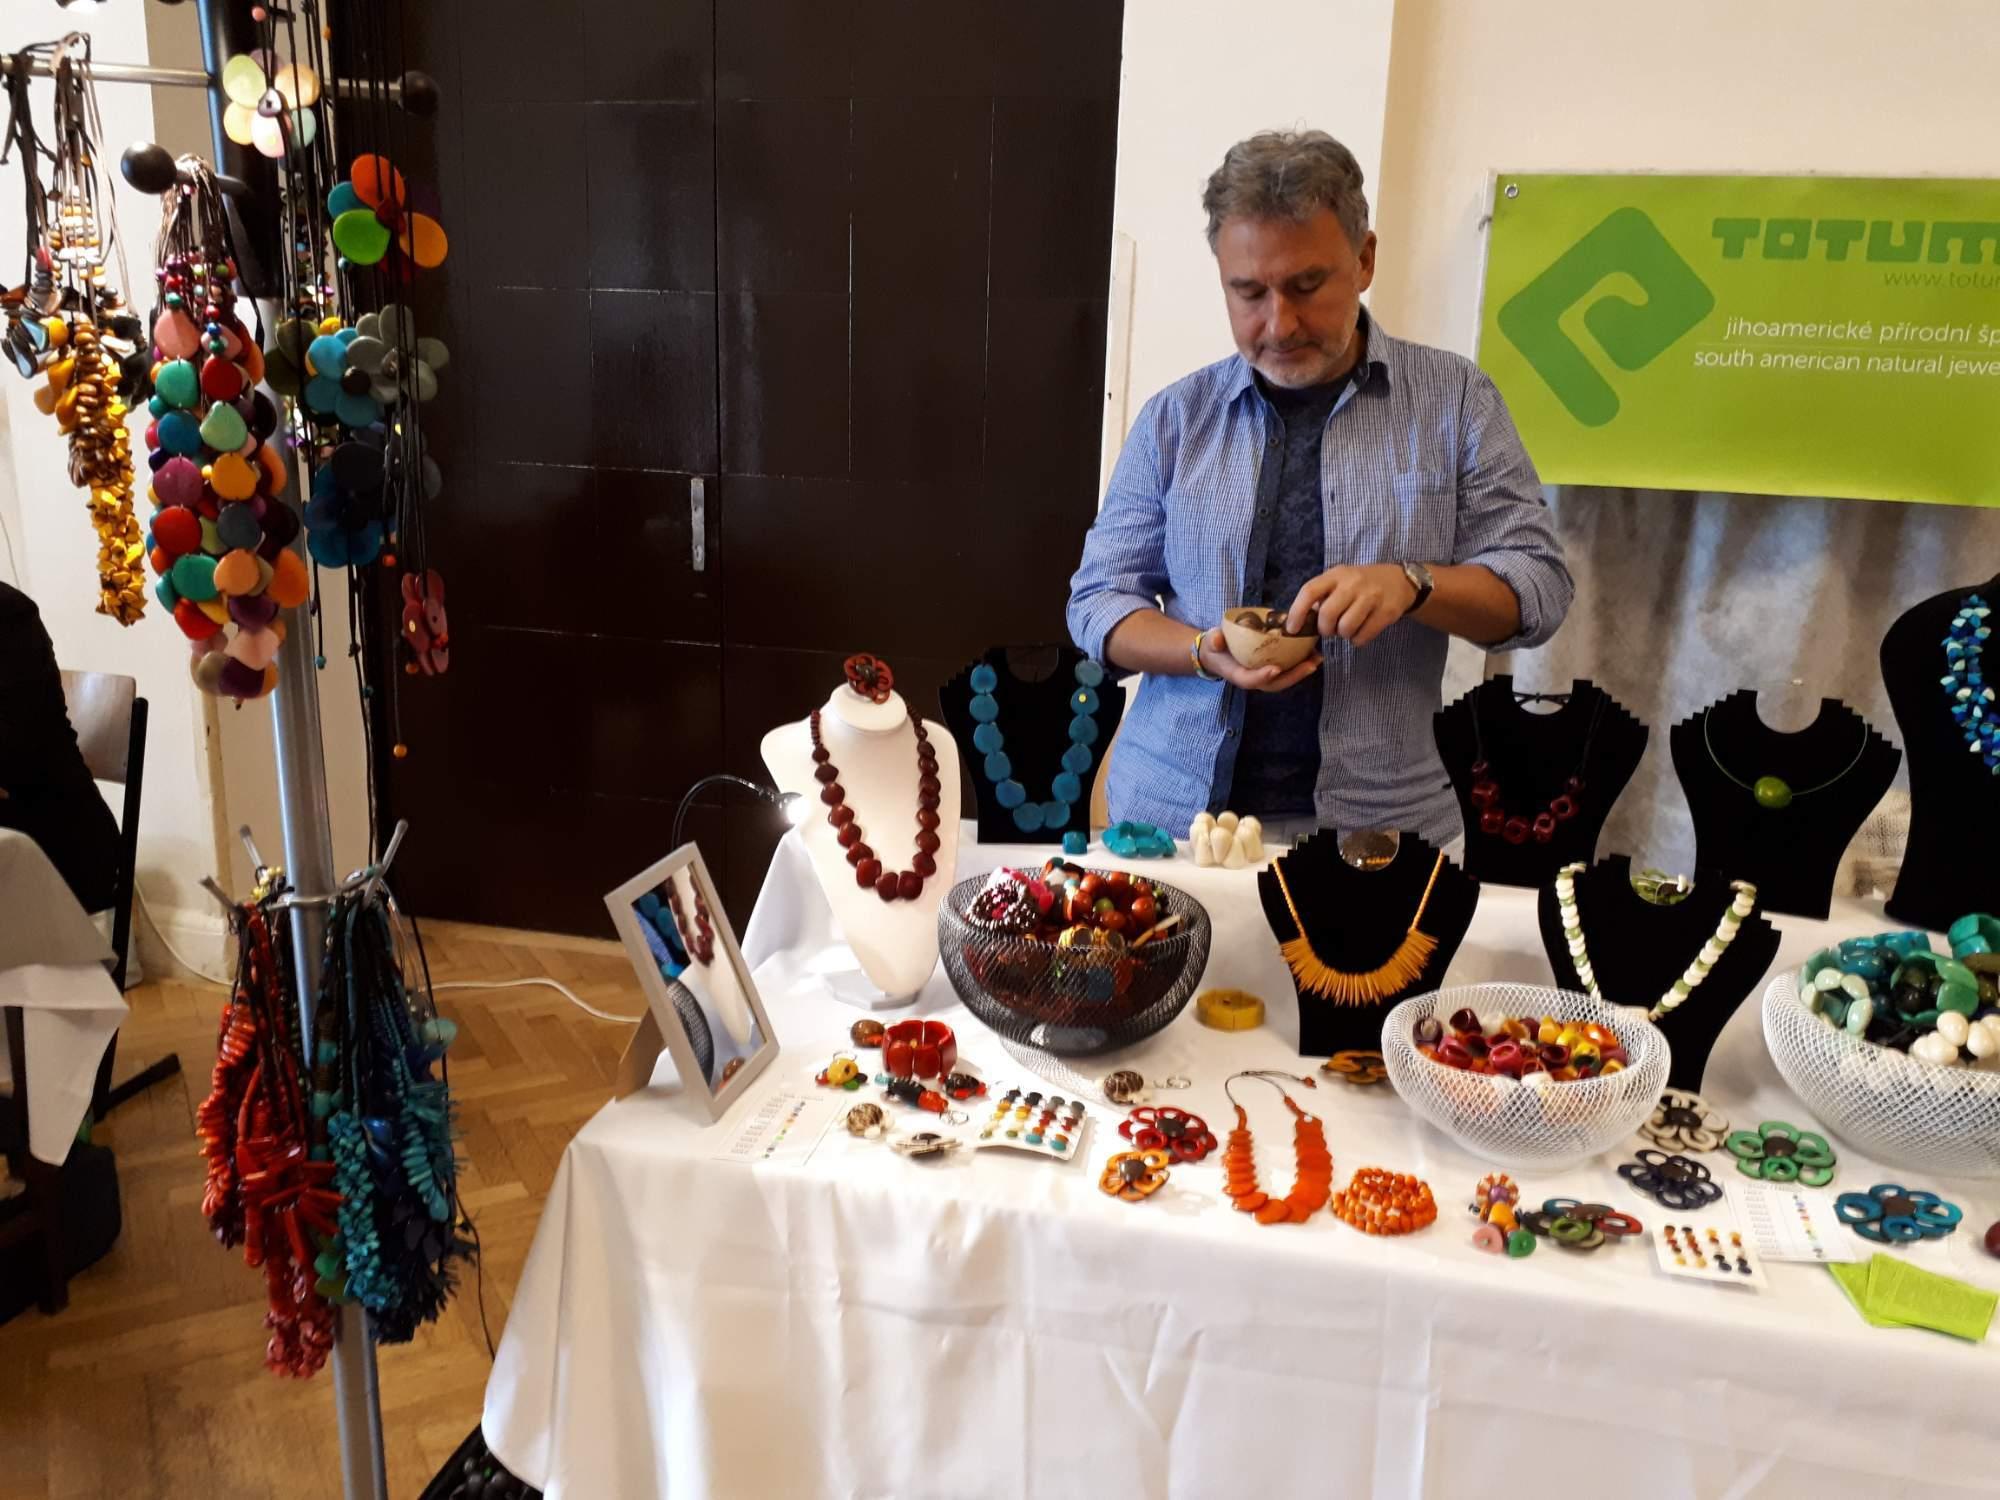 Pestrobarevné šperky vyrobené z ořechu tagua. Foto: Jana Blahošová